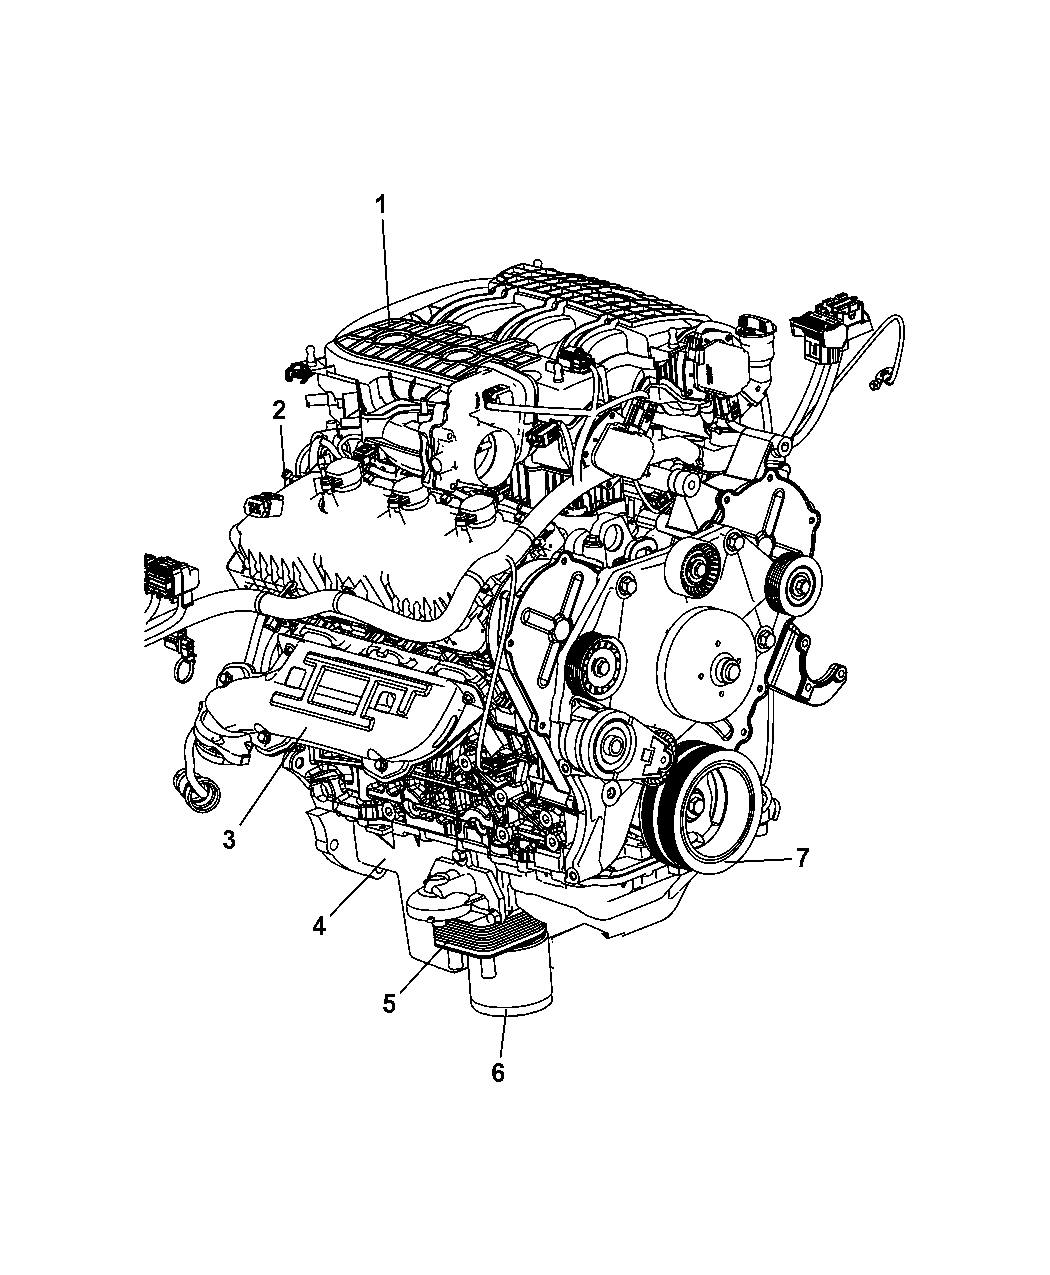 2007 dodge nitro engine assembly identification rh moparpartsgiant com Nitro Engine Breakdown Nitro Drag Racing Engines